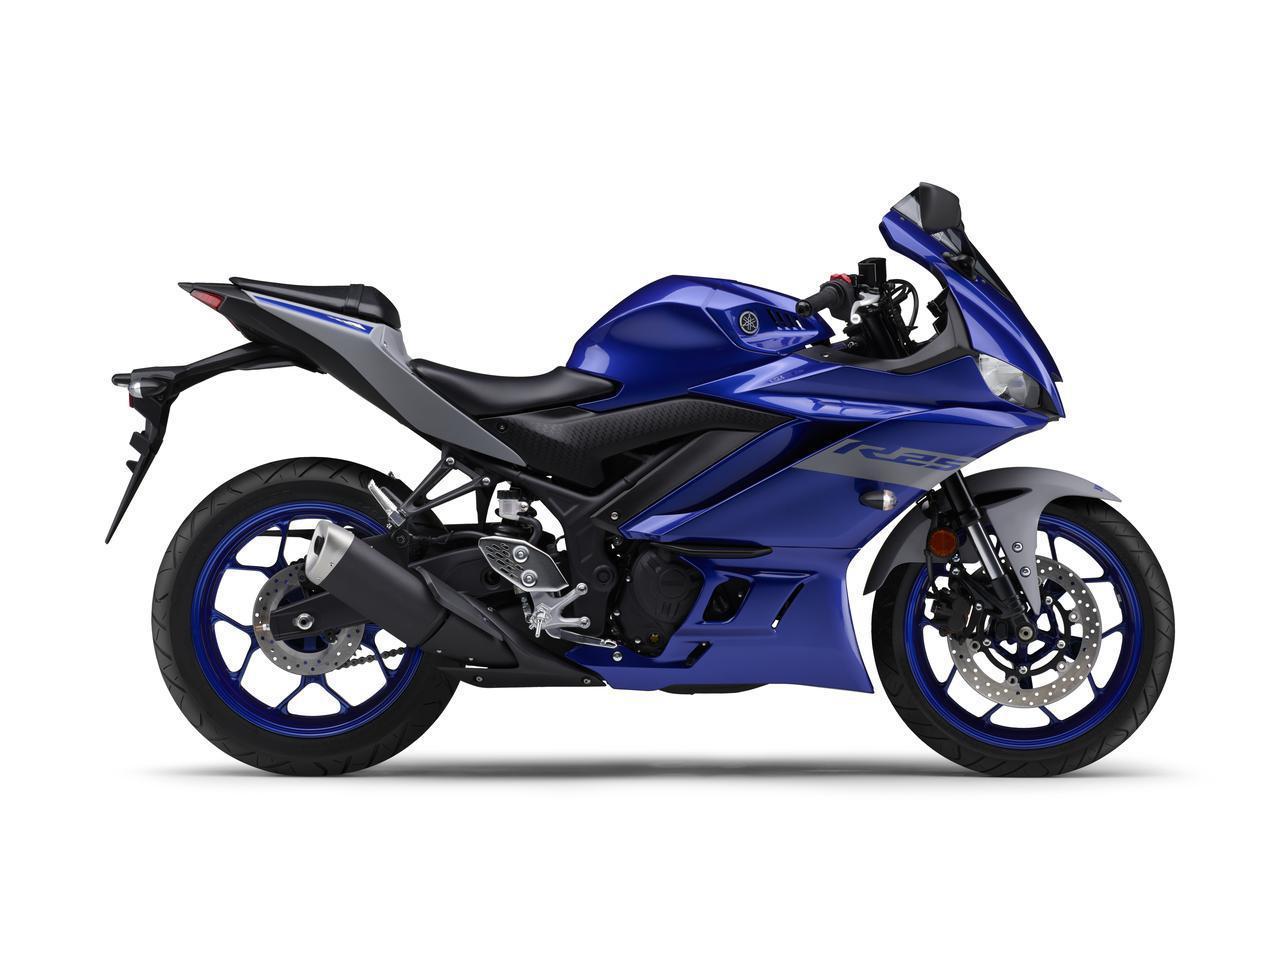 Images : 3番目の画像 - ヤマハ YZF-R25の写真をまとめて見る! - LAWRENCE - Motorcycle x Cars + α = Your Life.